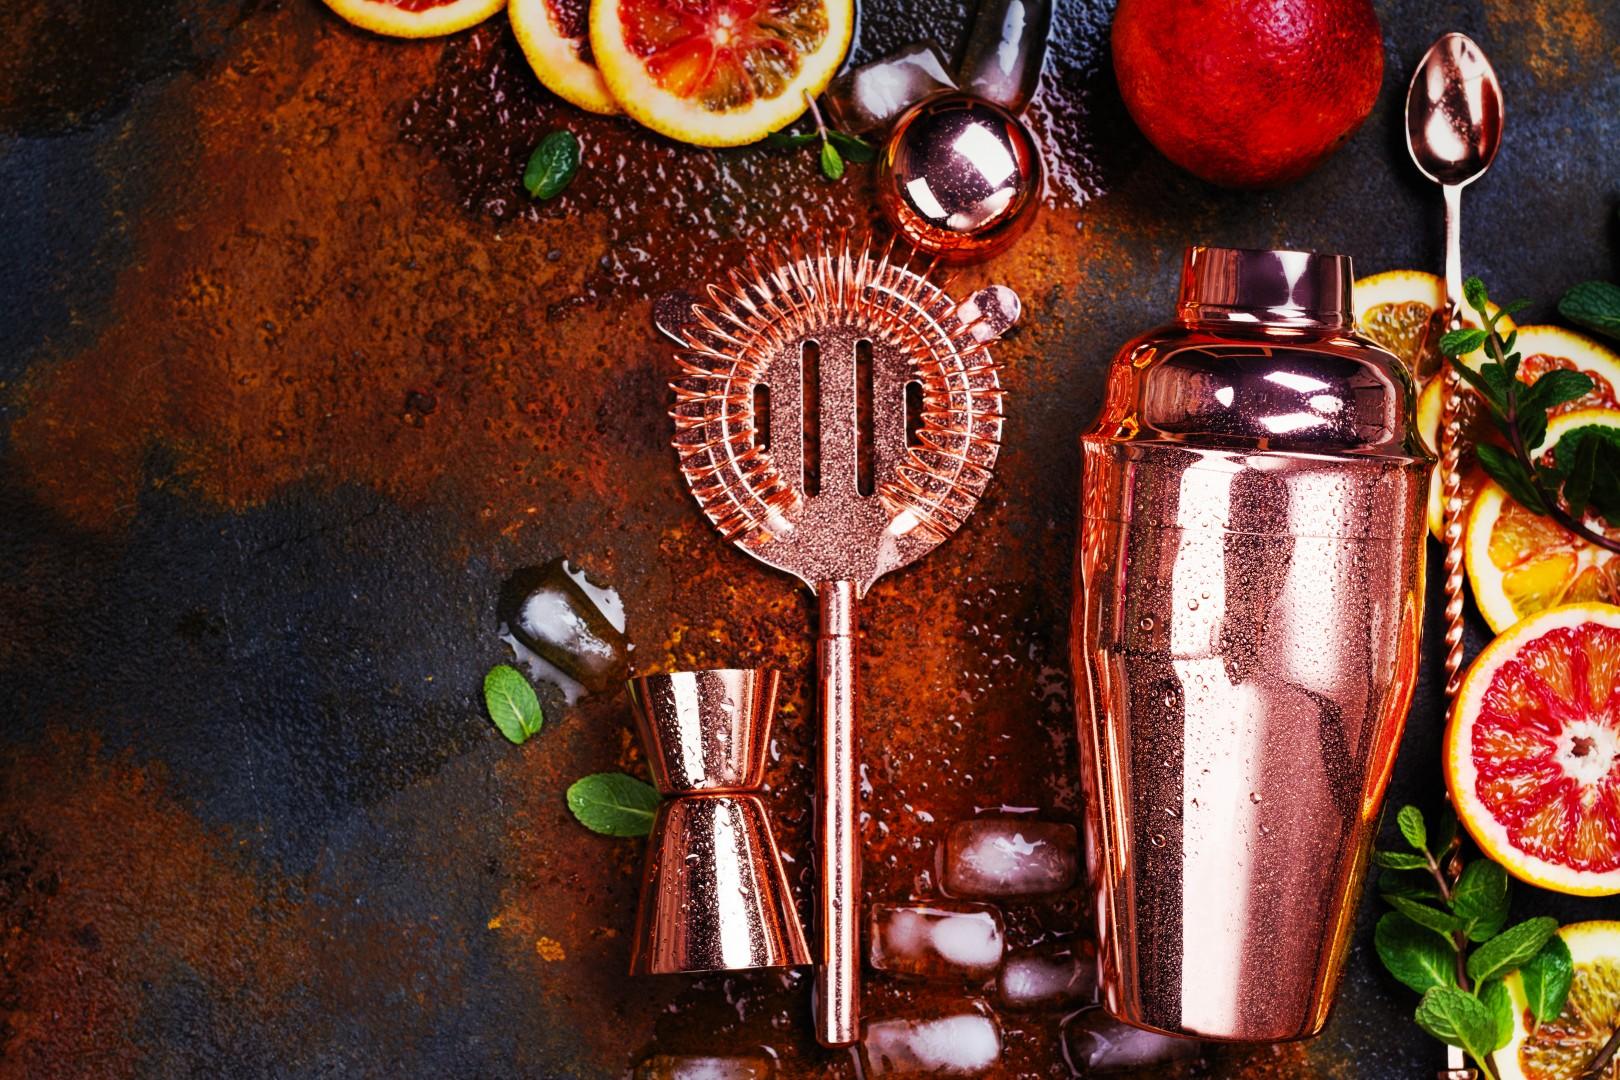 Guilt-Free CocktailsCocktail Maker Kit With Fruits